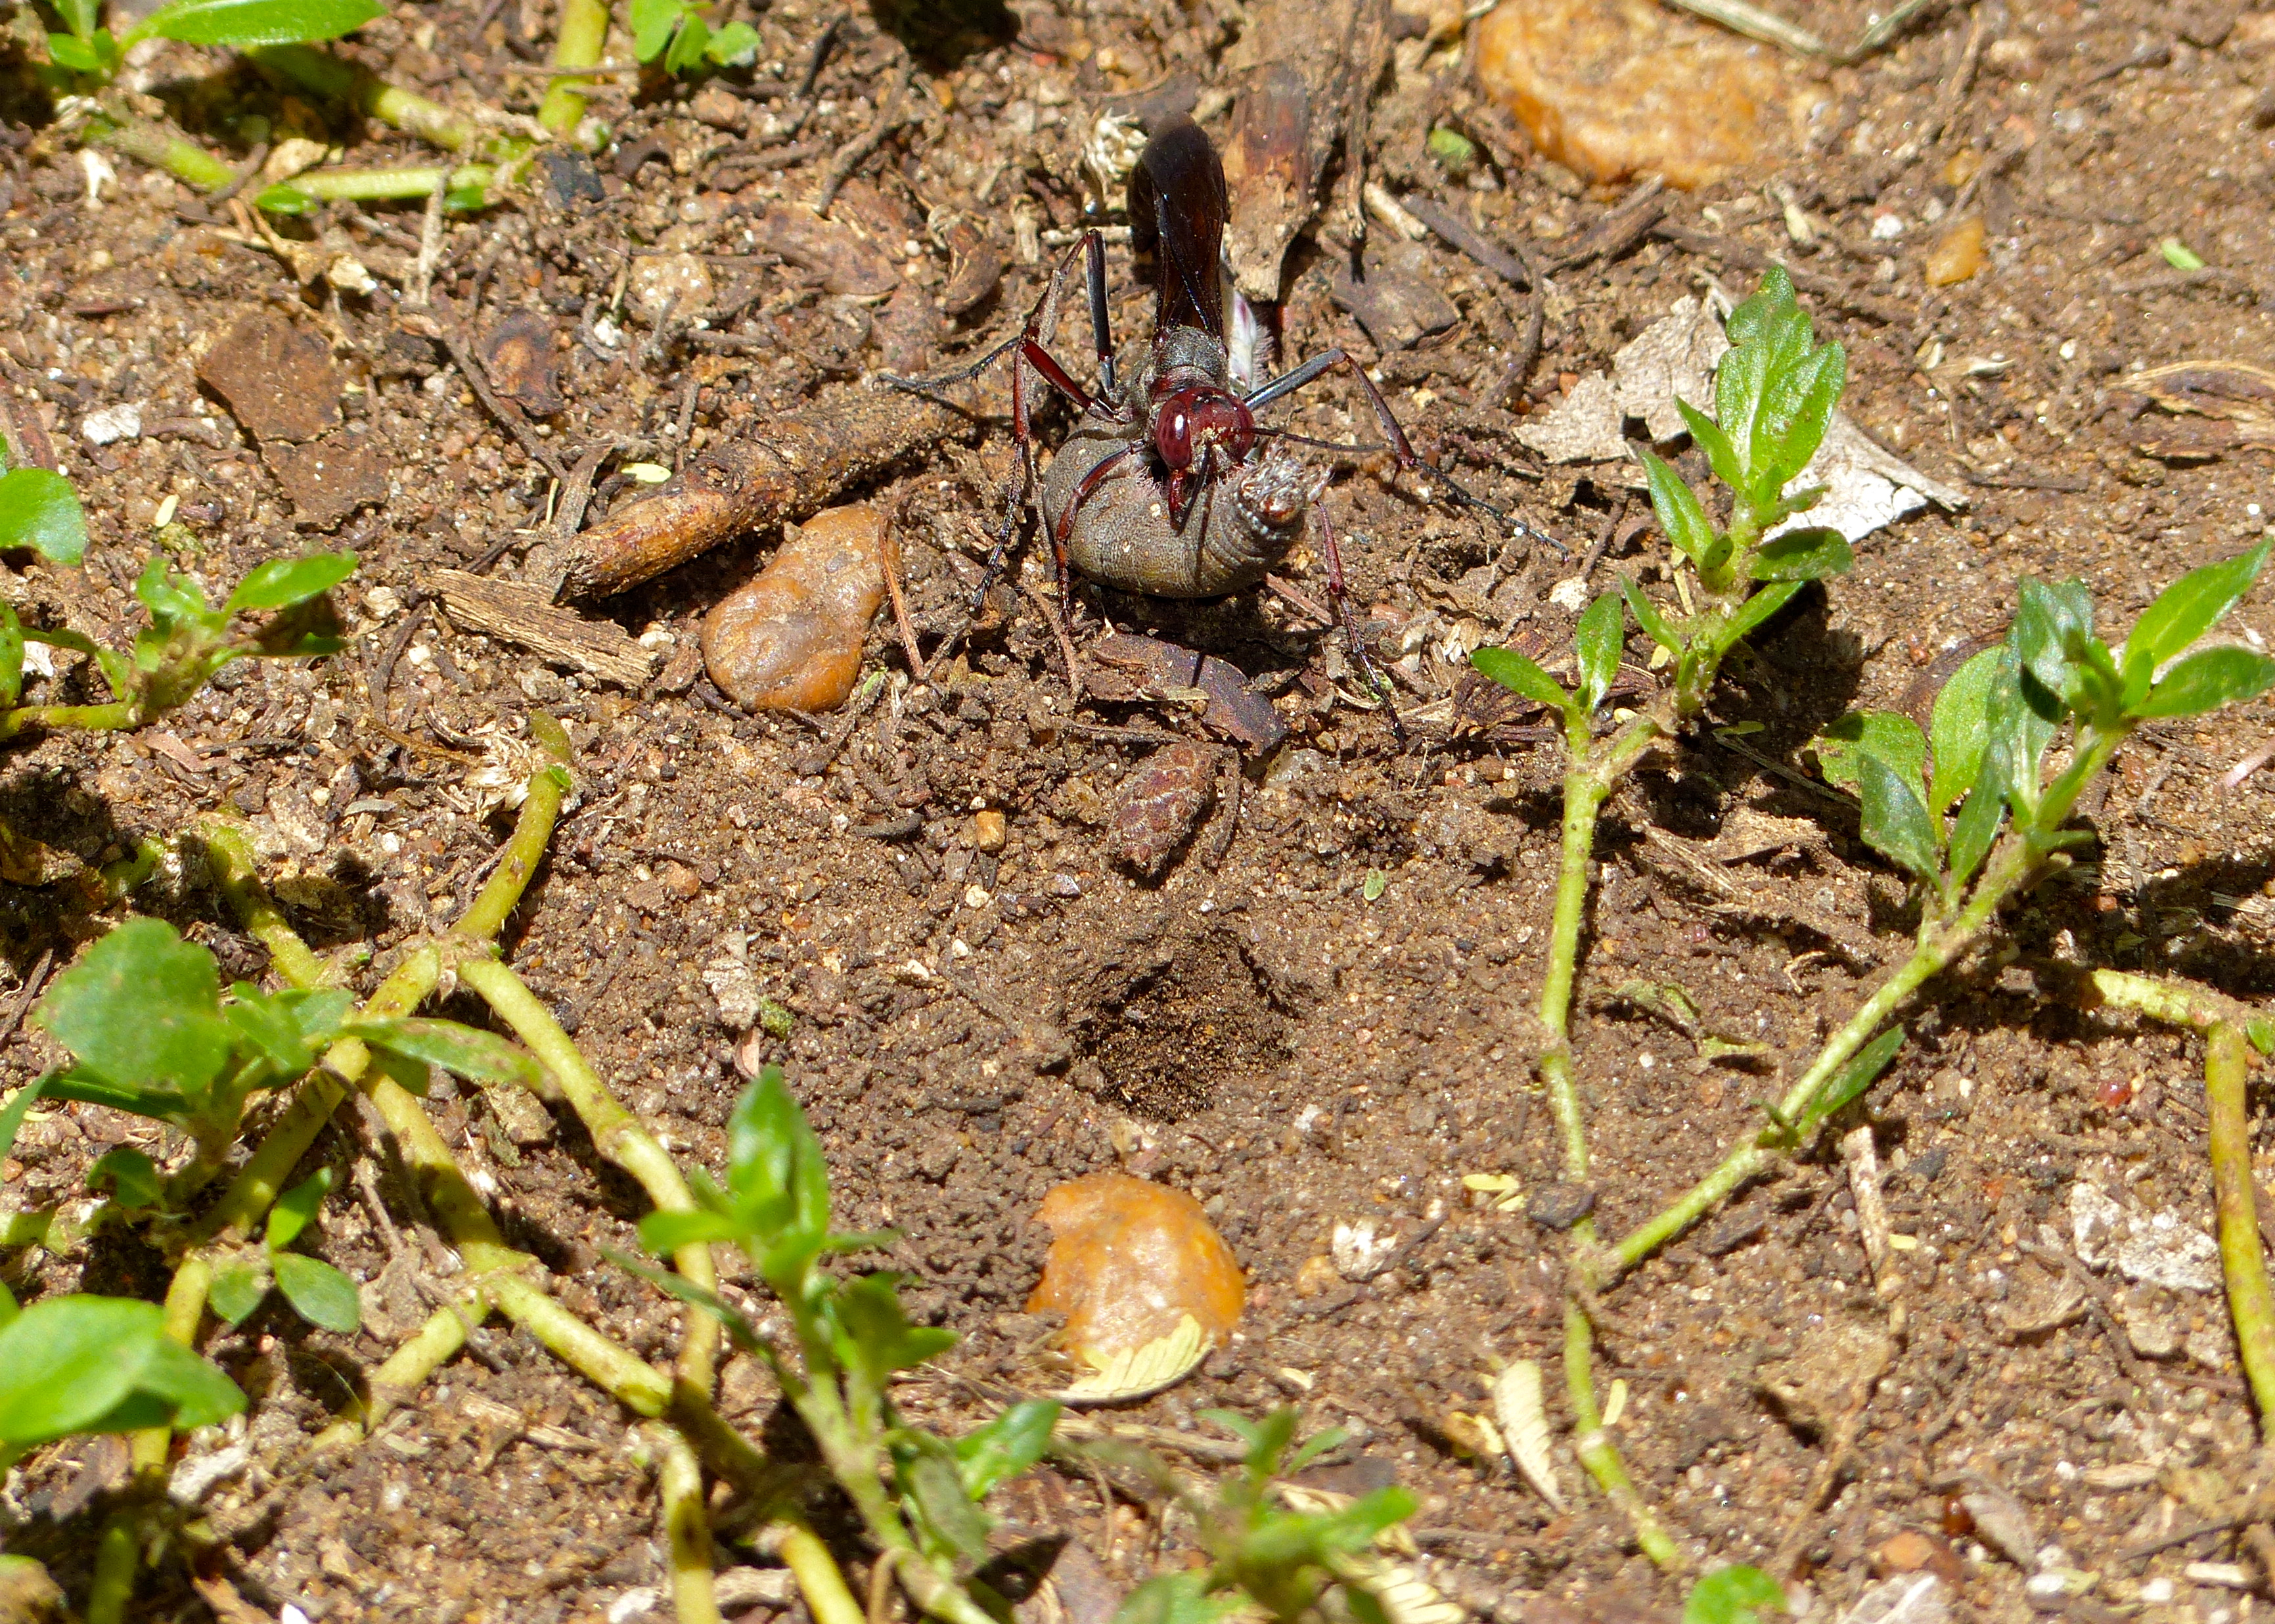 Bộ sưu tập côn trùng 2 Sand_Wasp_%28Ammophila_calva%29_carrying_a_paralyzed_caterpillar_near_its_underground_nest_%2813850213525%29